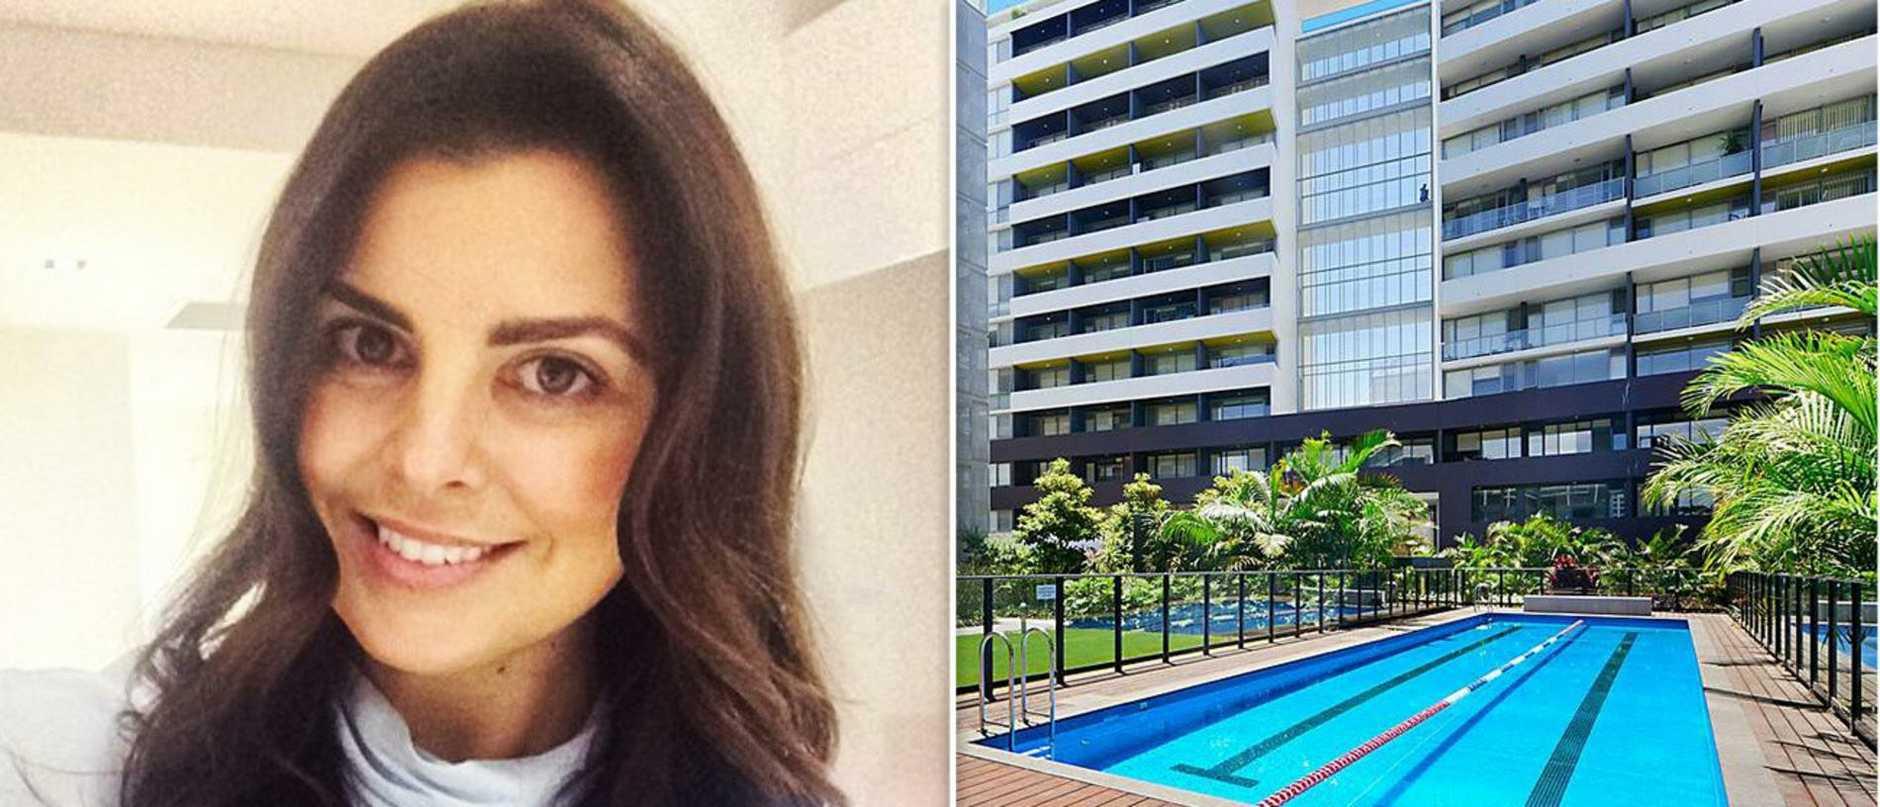 Zetland body shaming: Woman in bikini told to wear shorts at unit pool